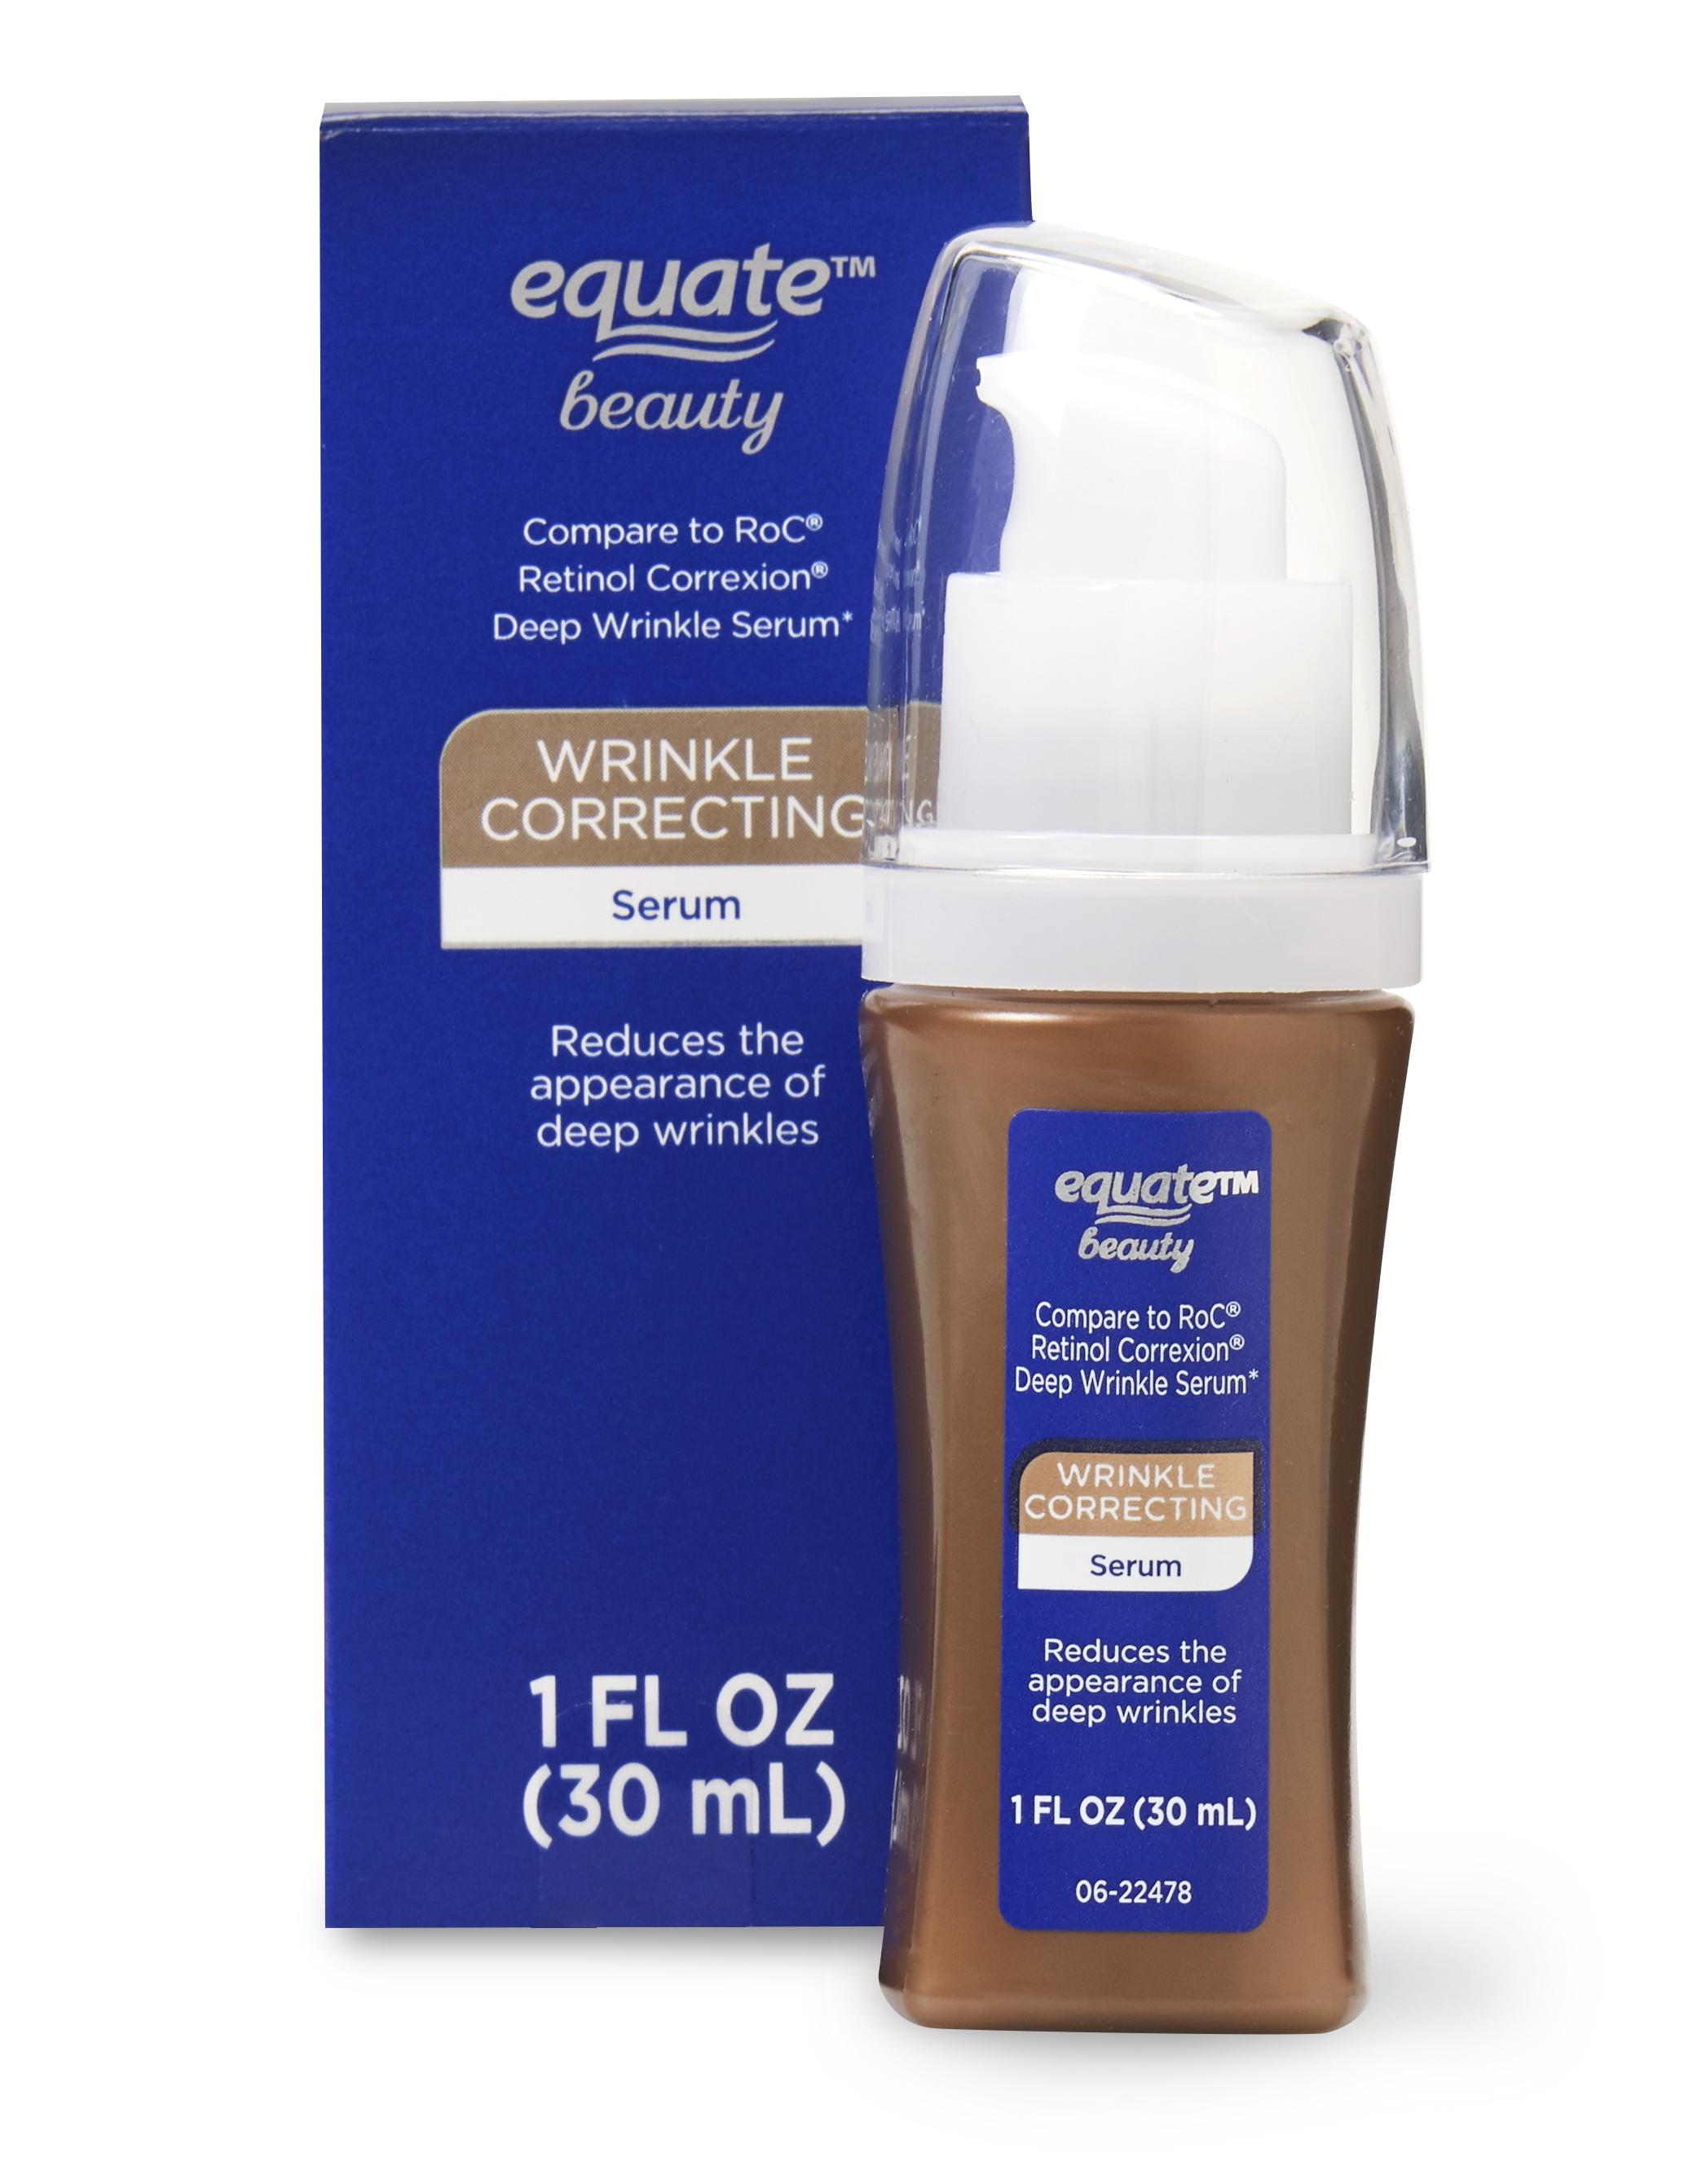 Equate Beauty Wrinkle Correcting Serum